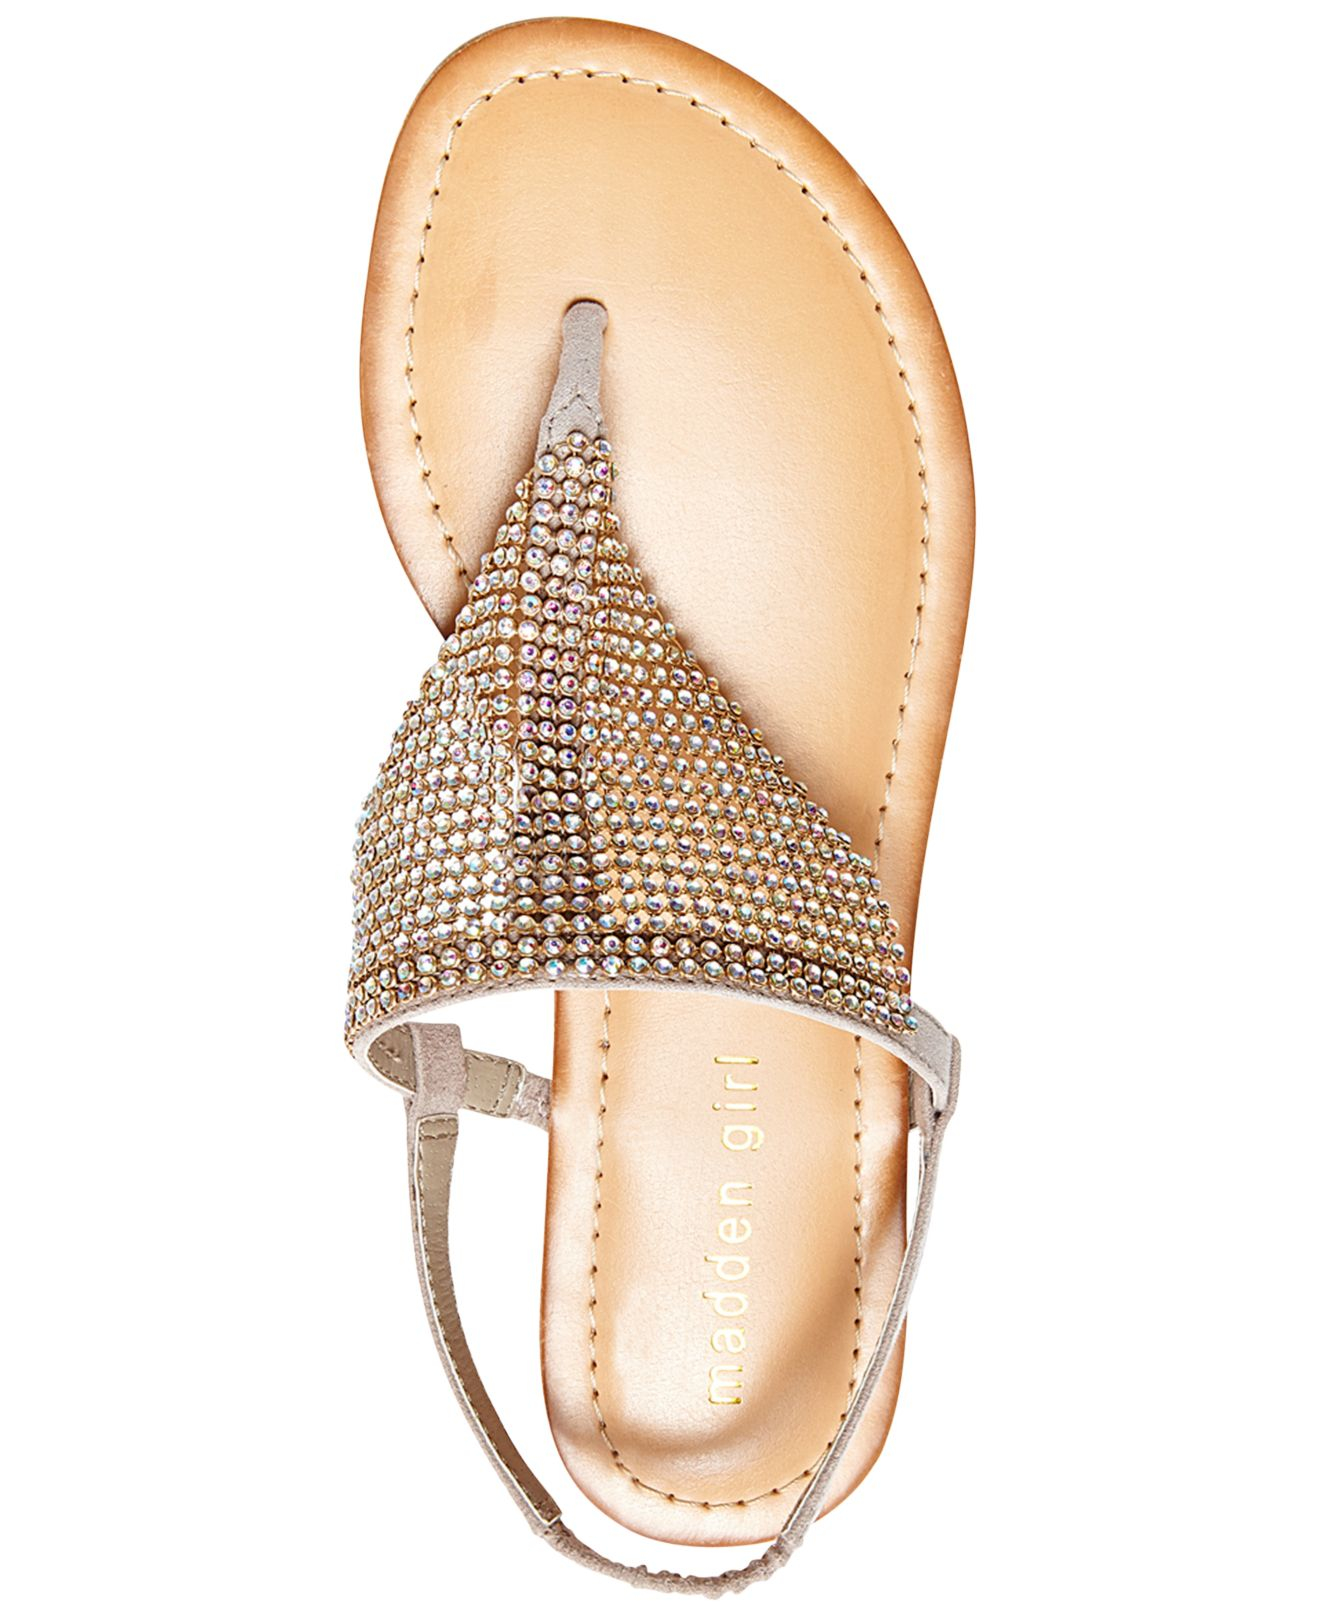 b821e78f0697dc Lyst - Madden Girl Sandie Rhinestone Hooded Flat Thong Sandals in ...